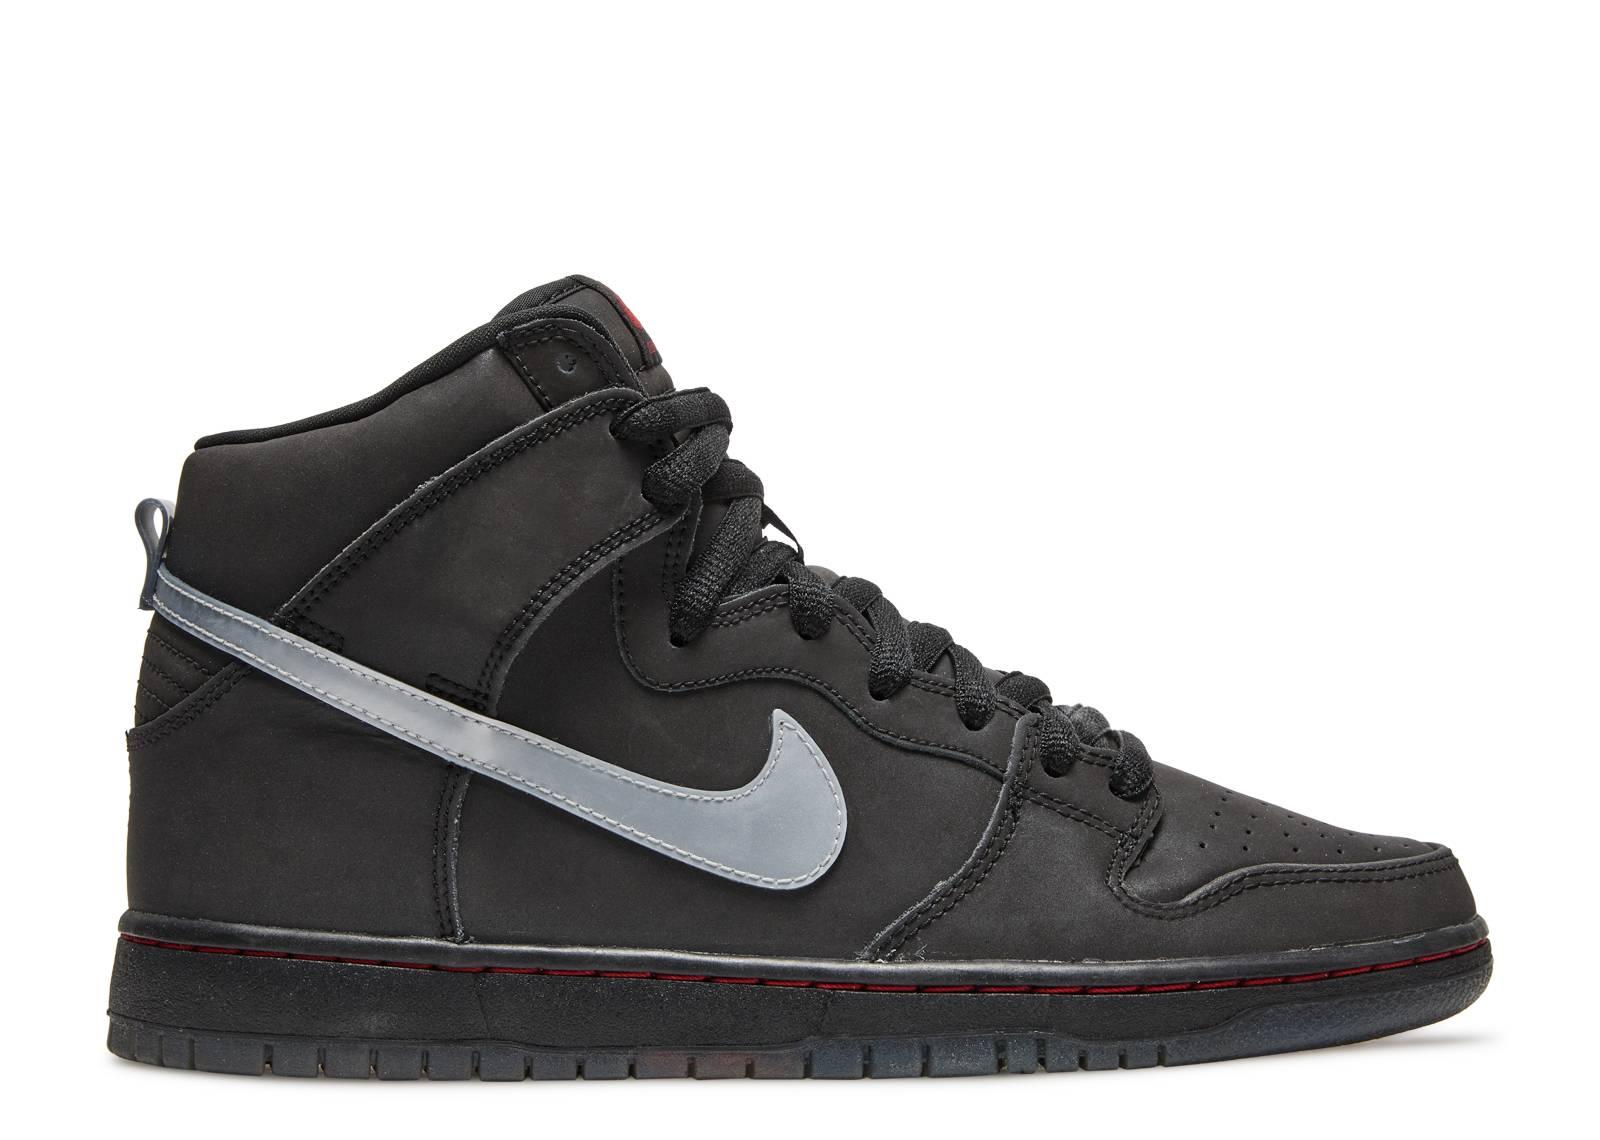 Nike Dunk High Premium SB 3M Pink Black White Shoes